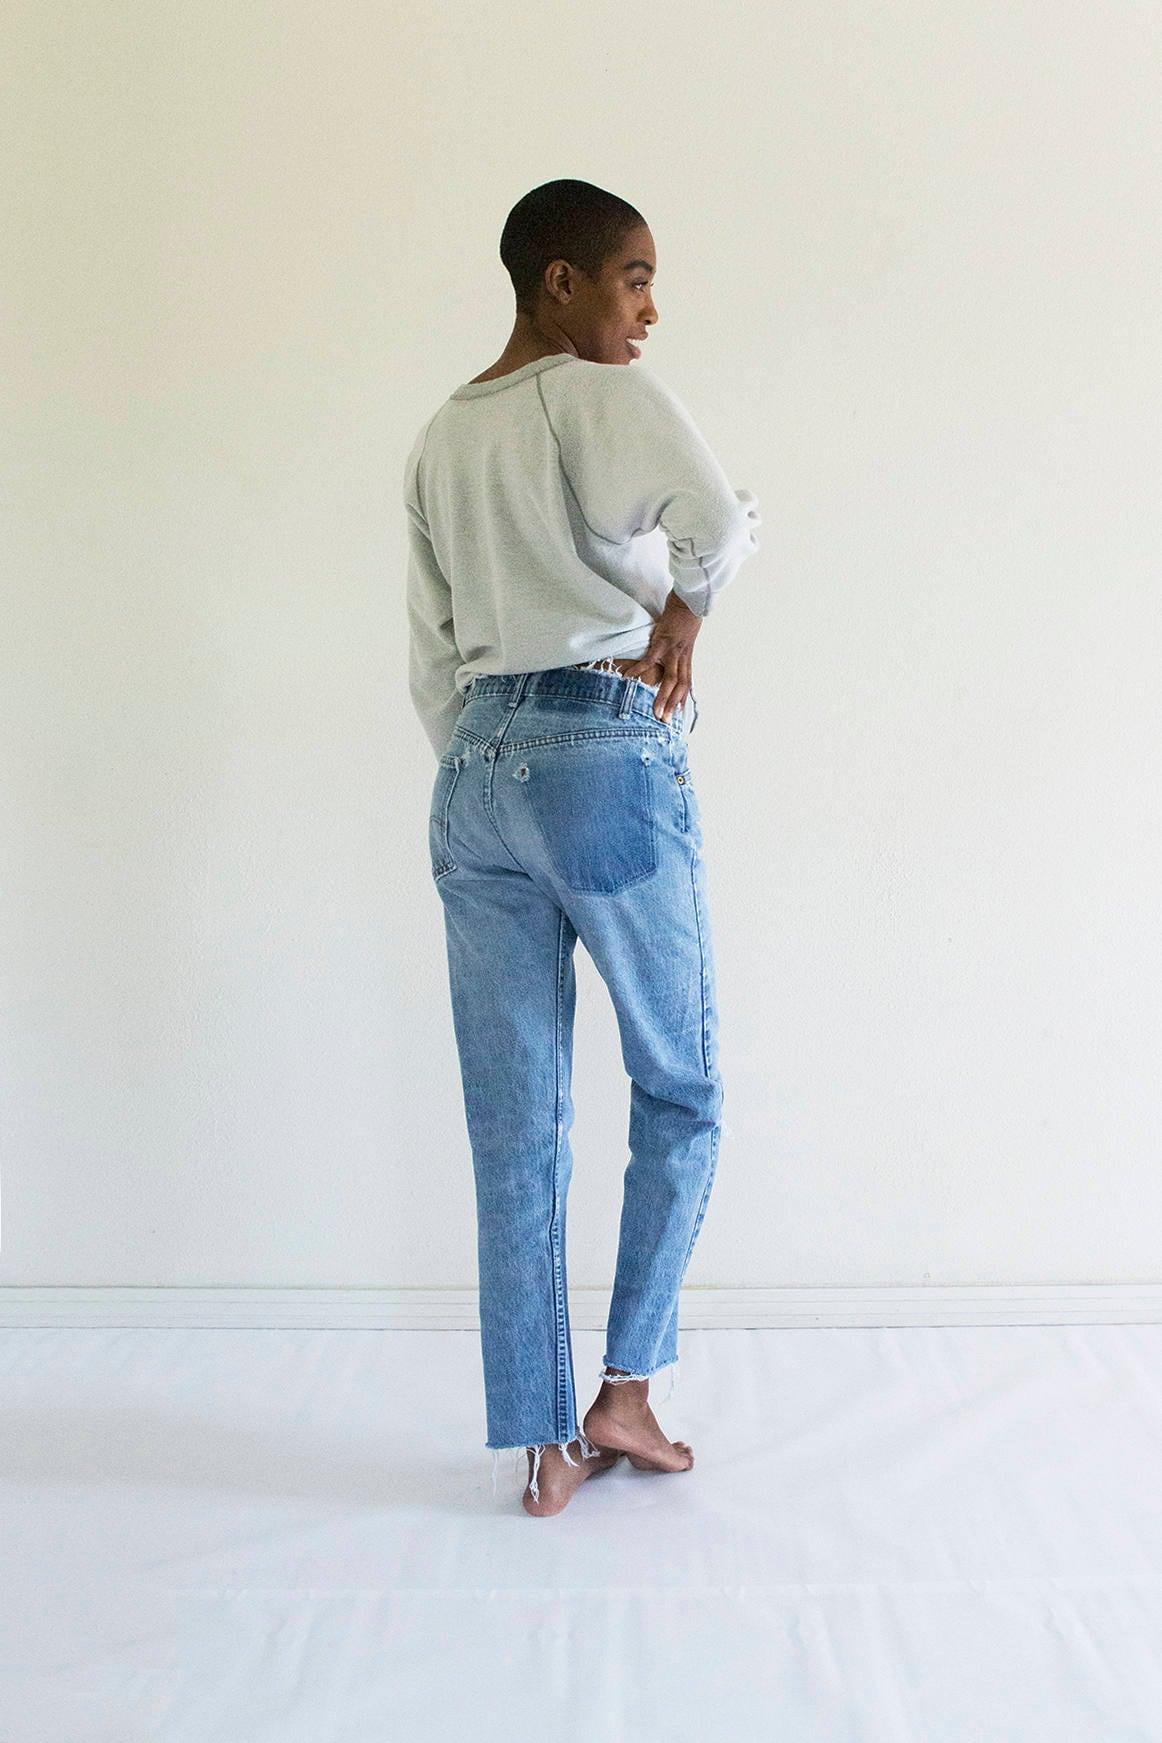 LEVI'S 505 High Waist Jeans size 29